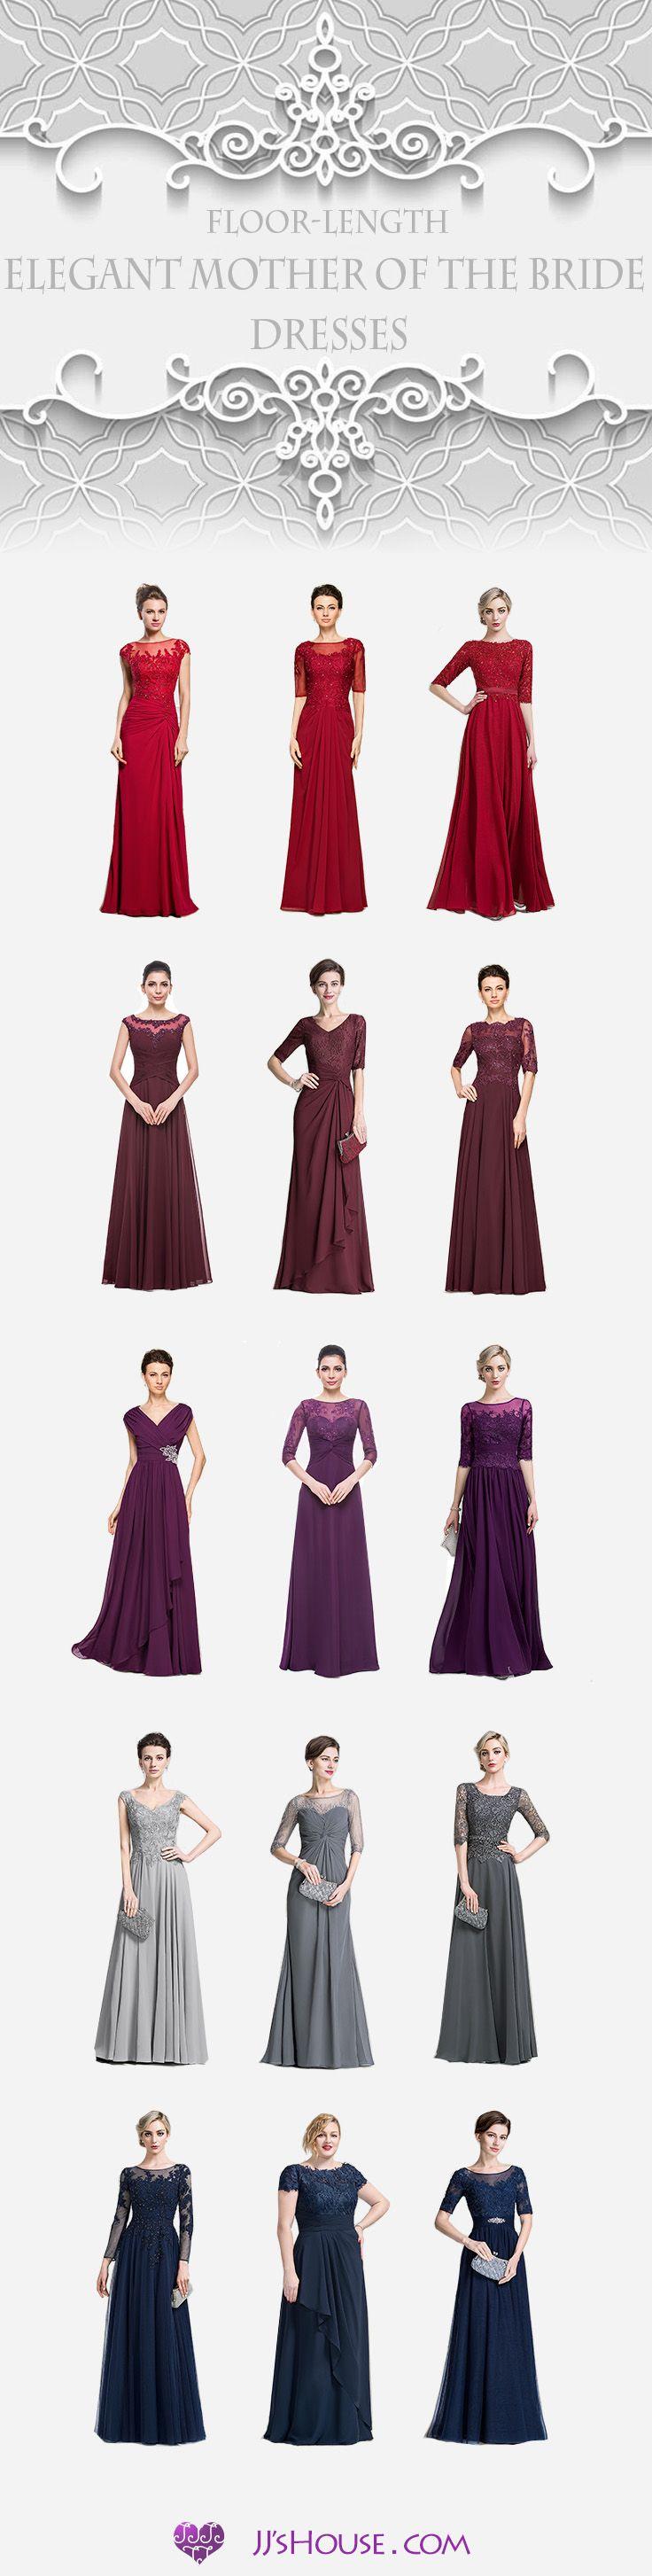 Floor-Length Elegant Mother of the Bride Dresses! #MotheroftheBrideDresses